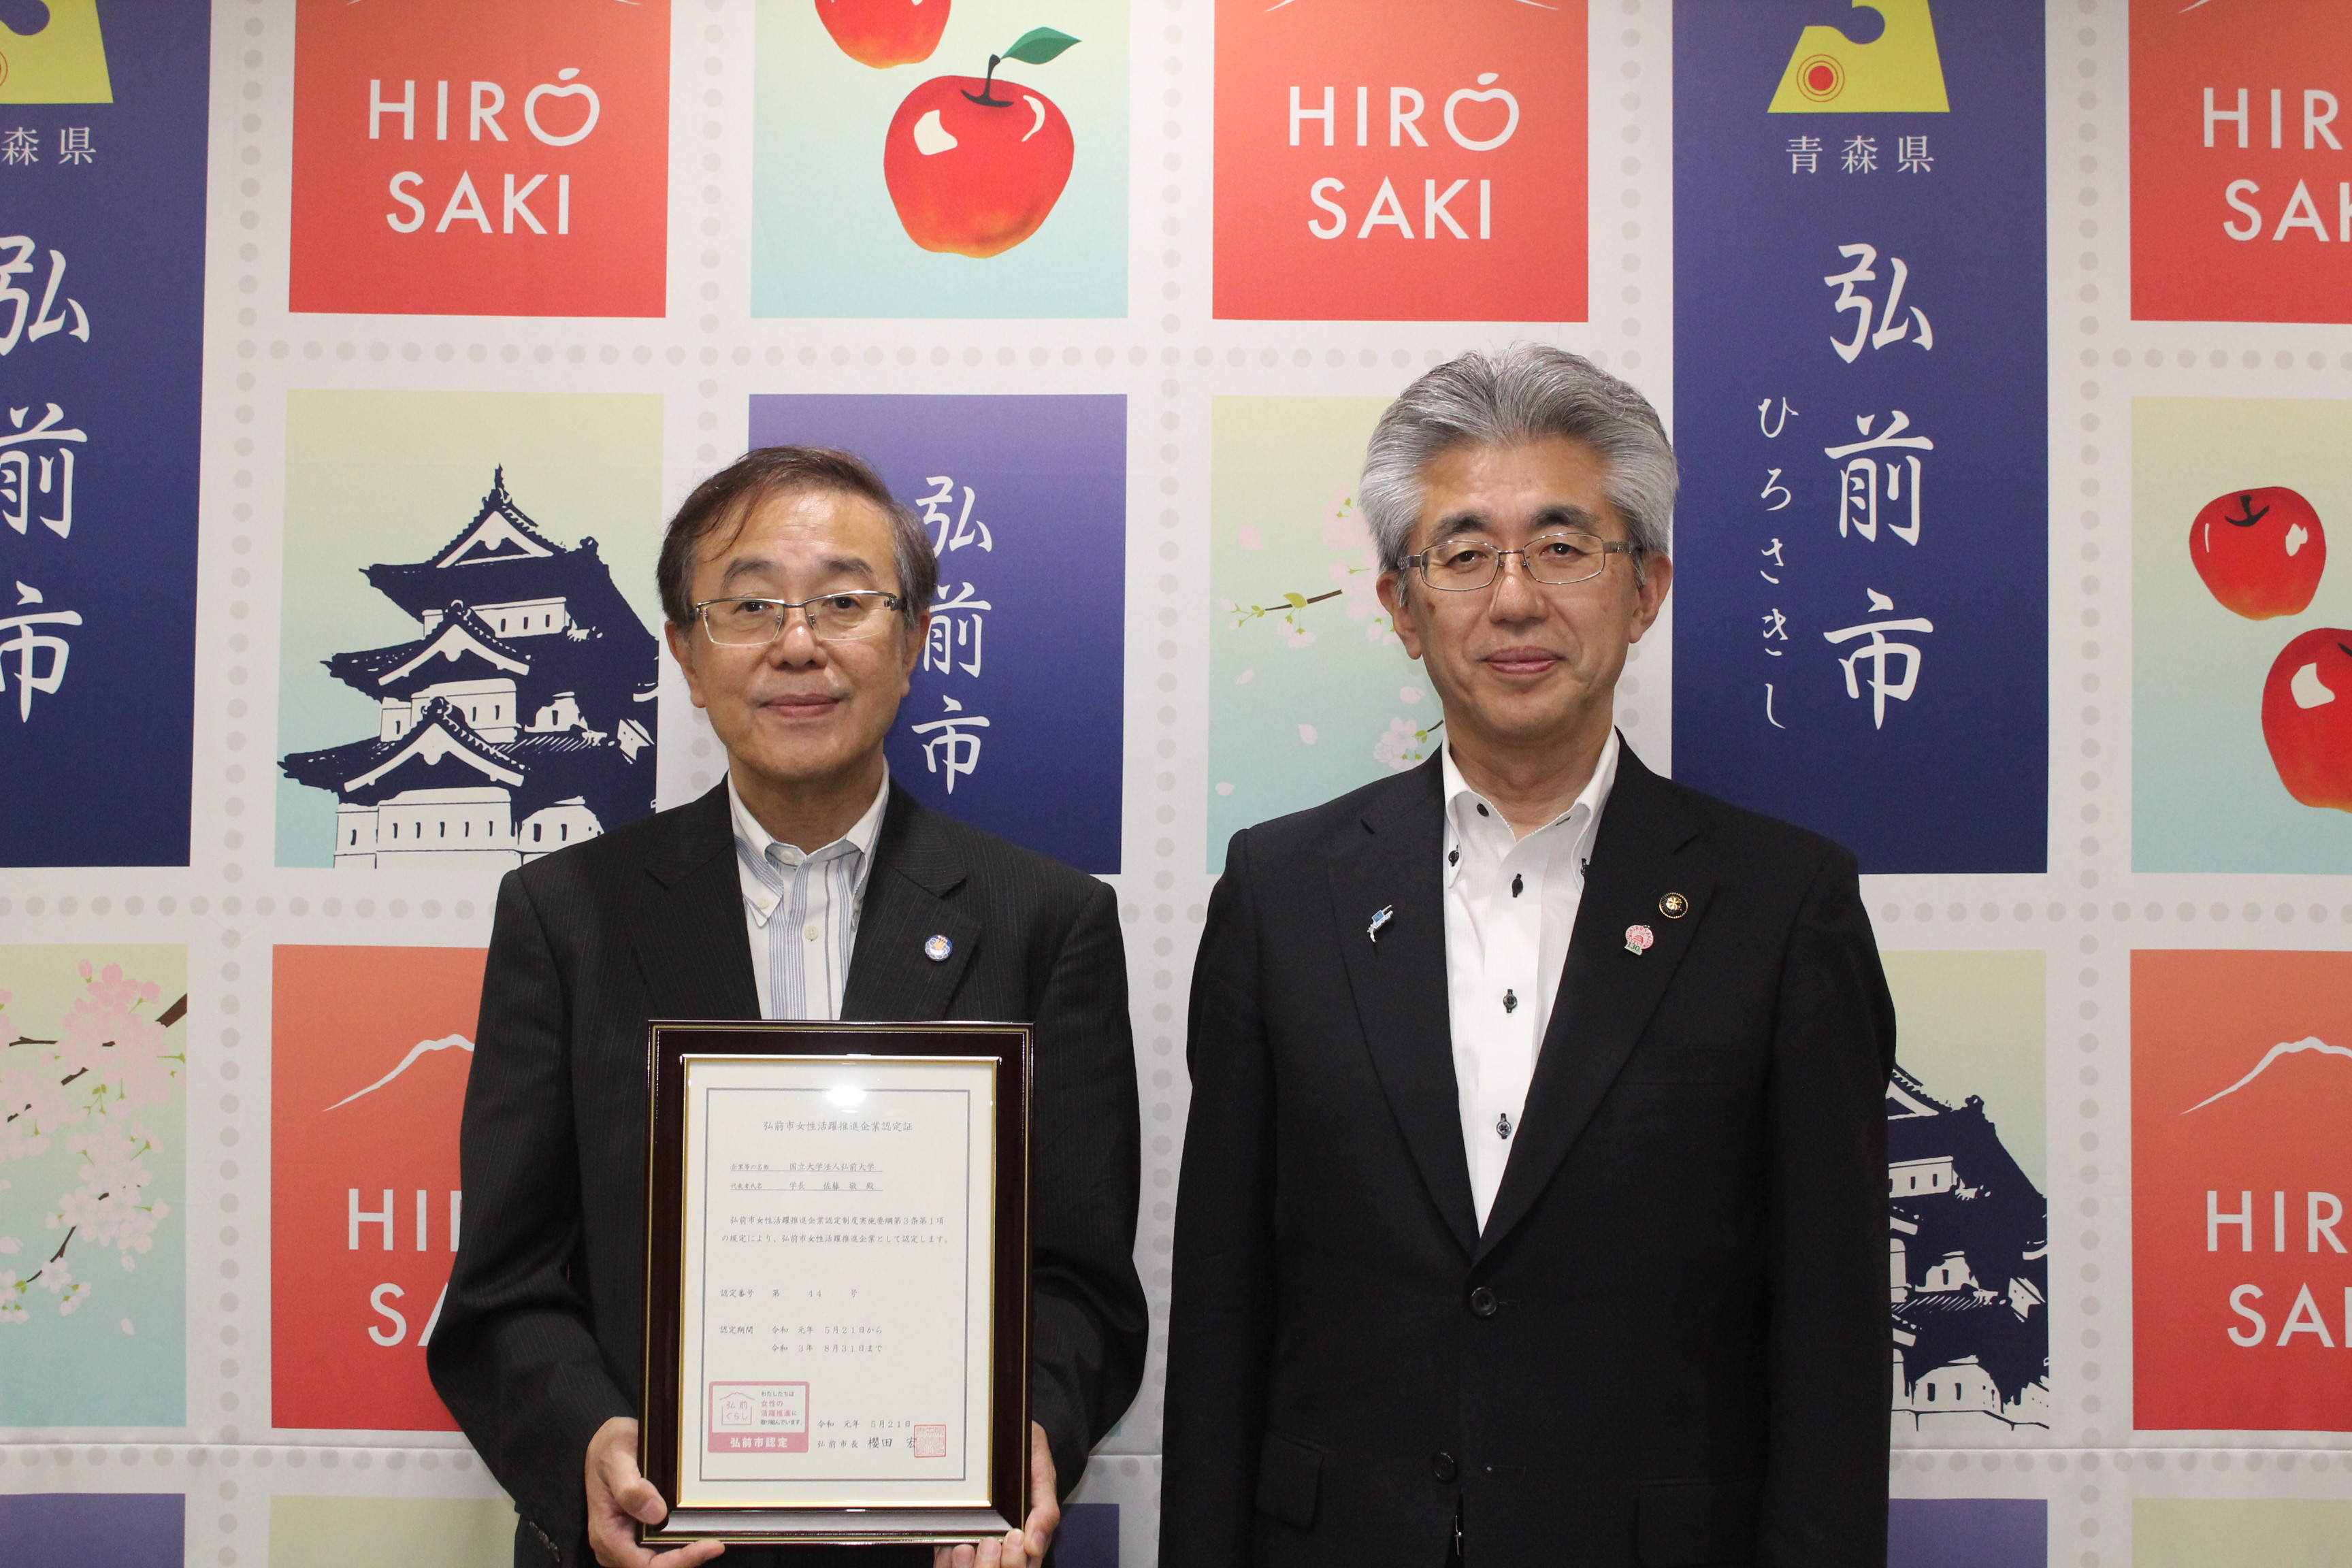 櫻田市長と佐藤学長